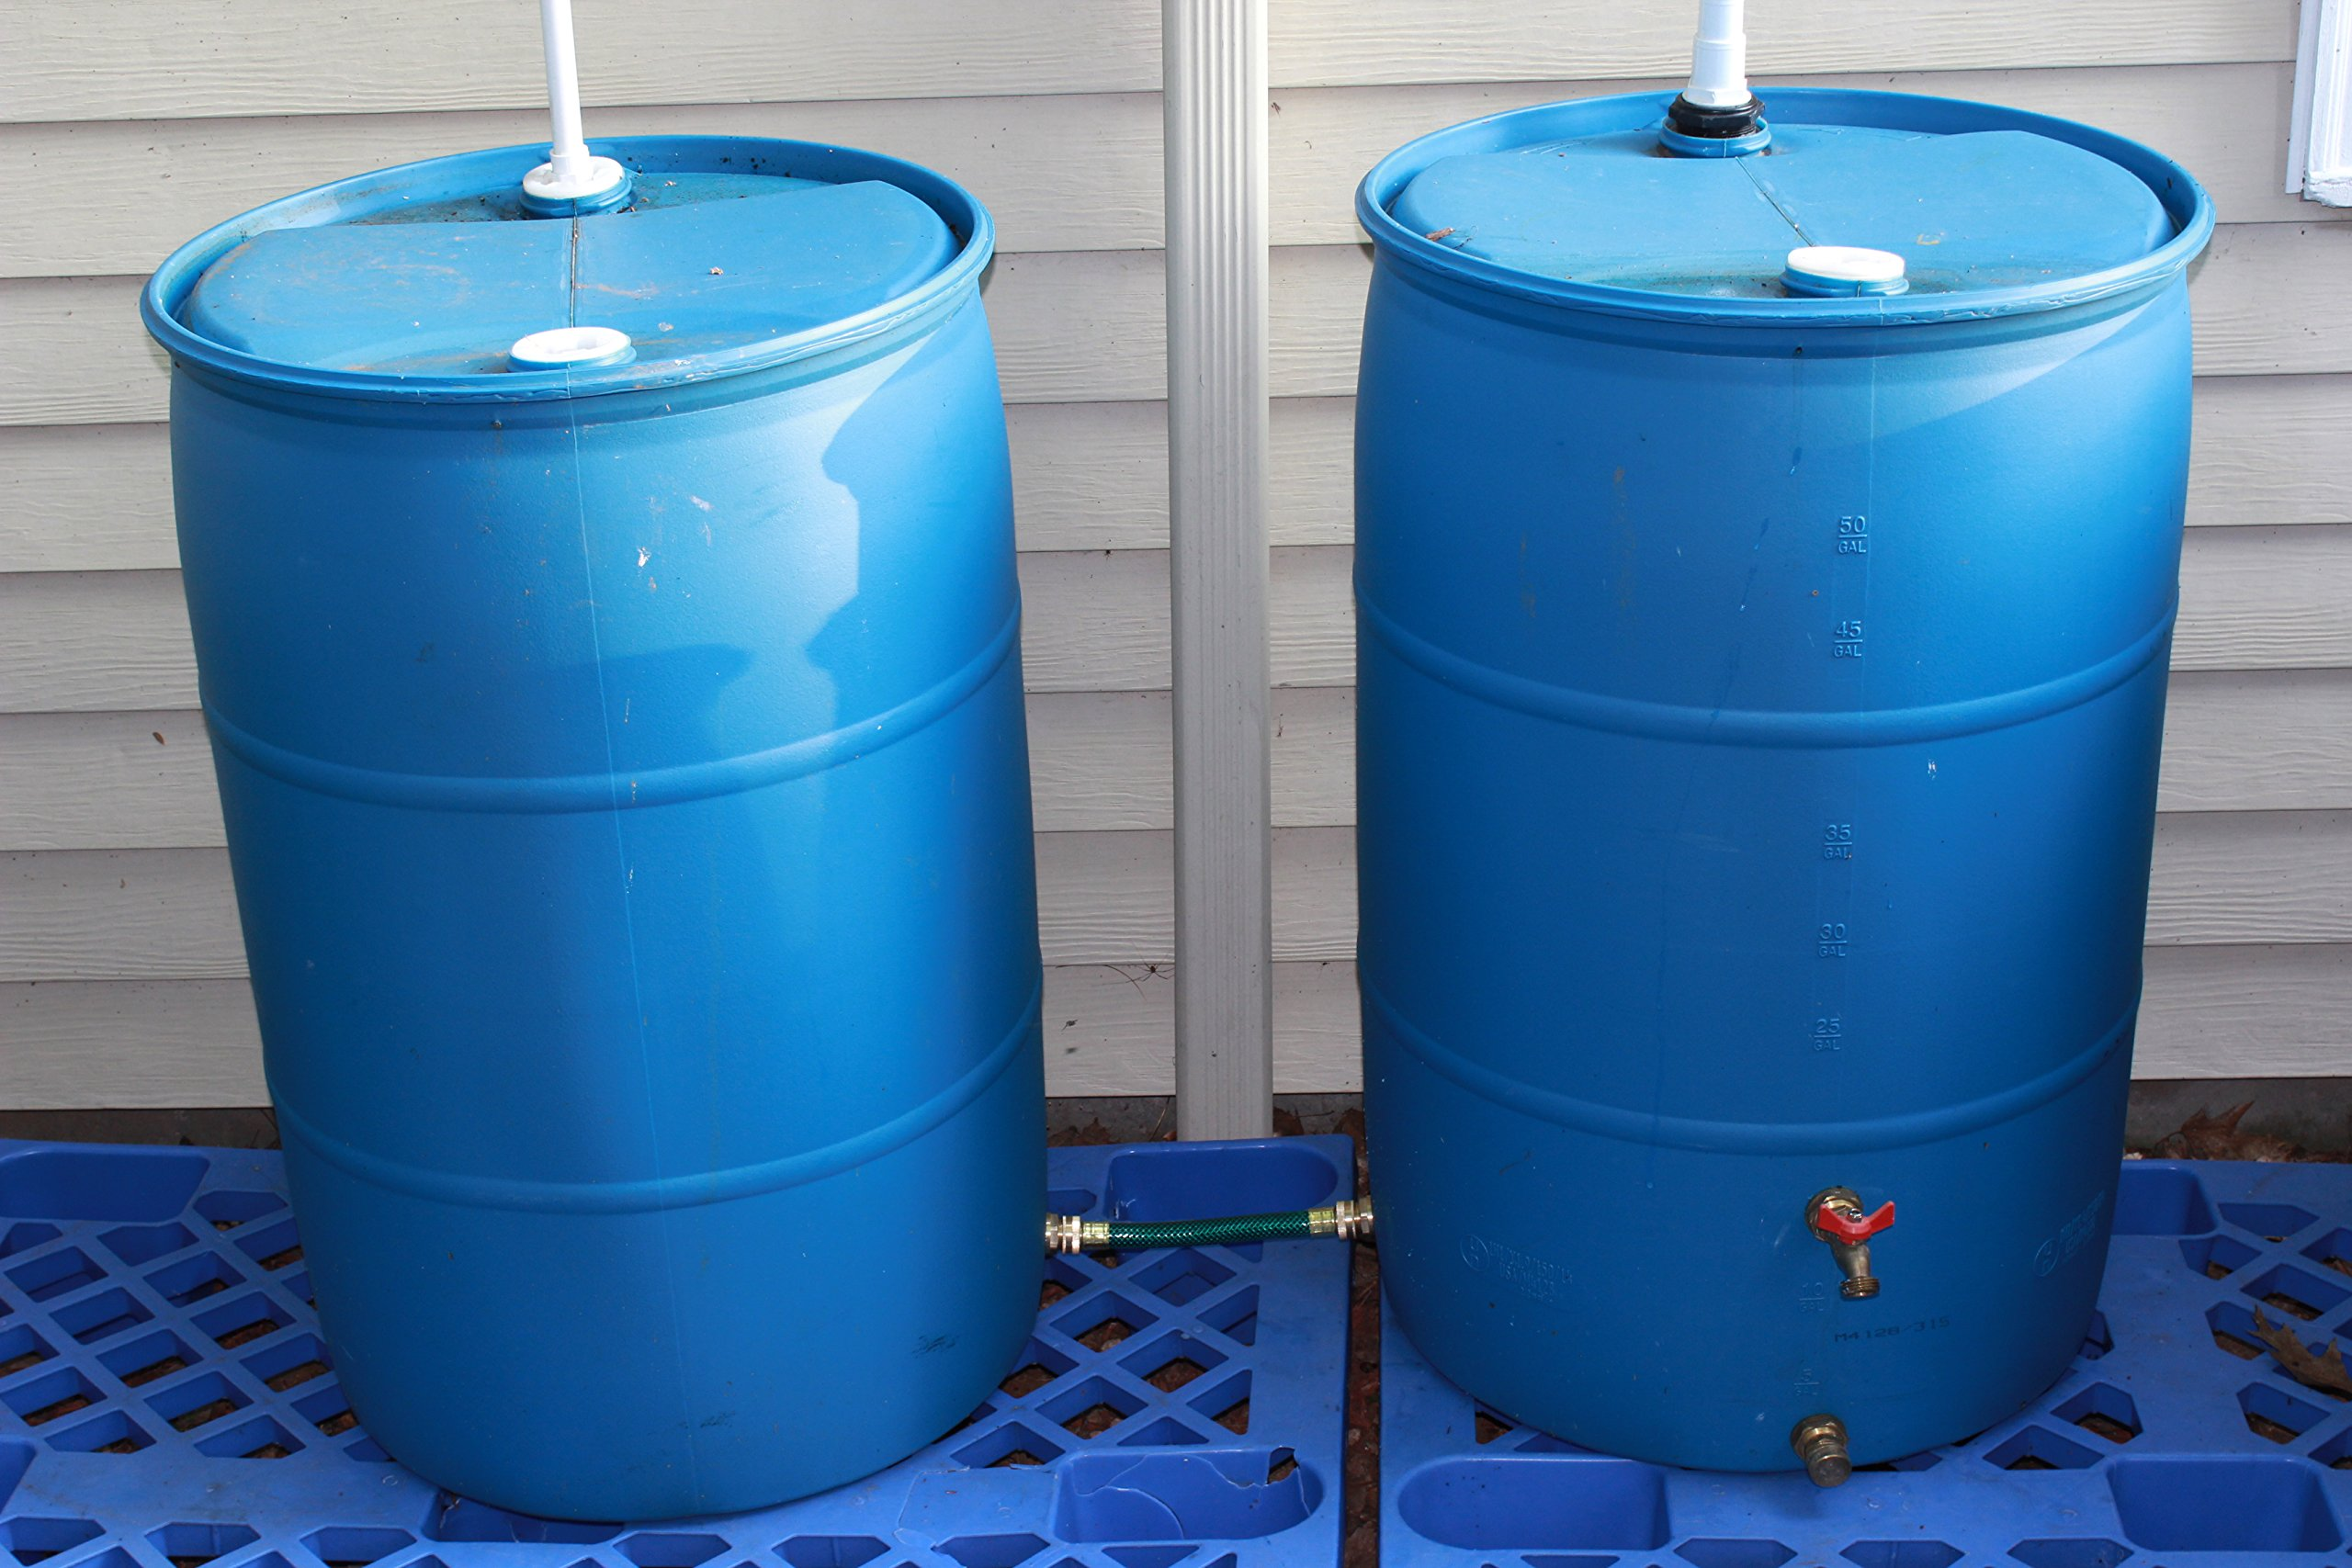 RAINPAL Rain Barrel Linking//Link//Connector Kit Two Brass Bulkhead Tank Fittings